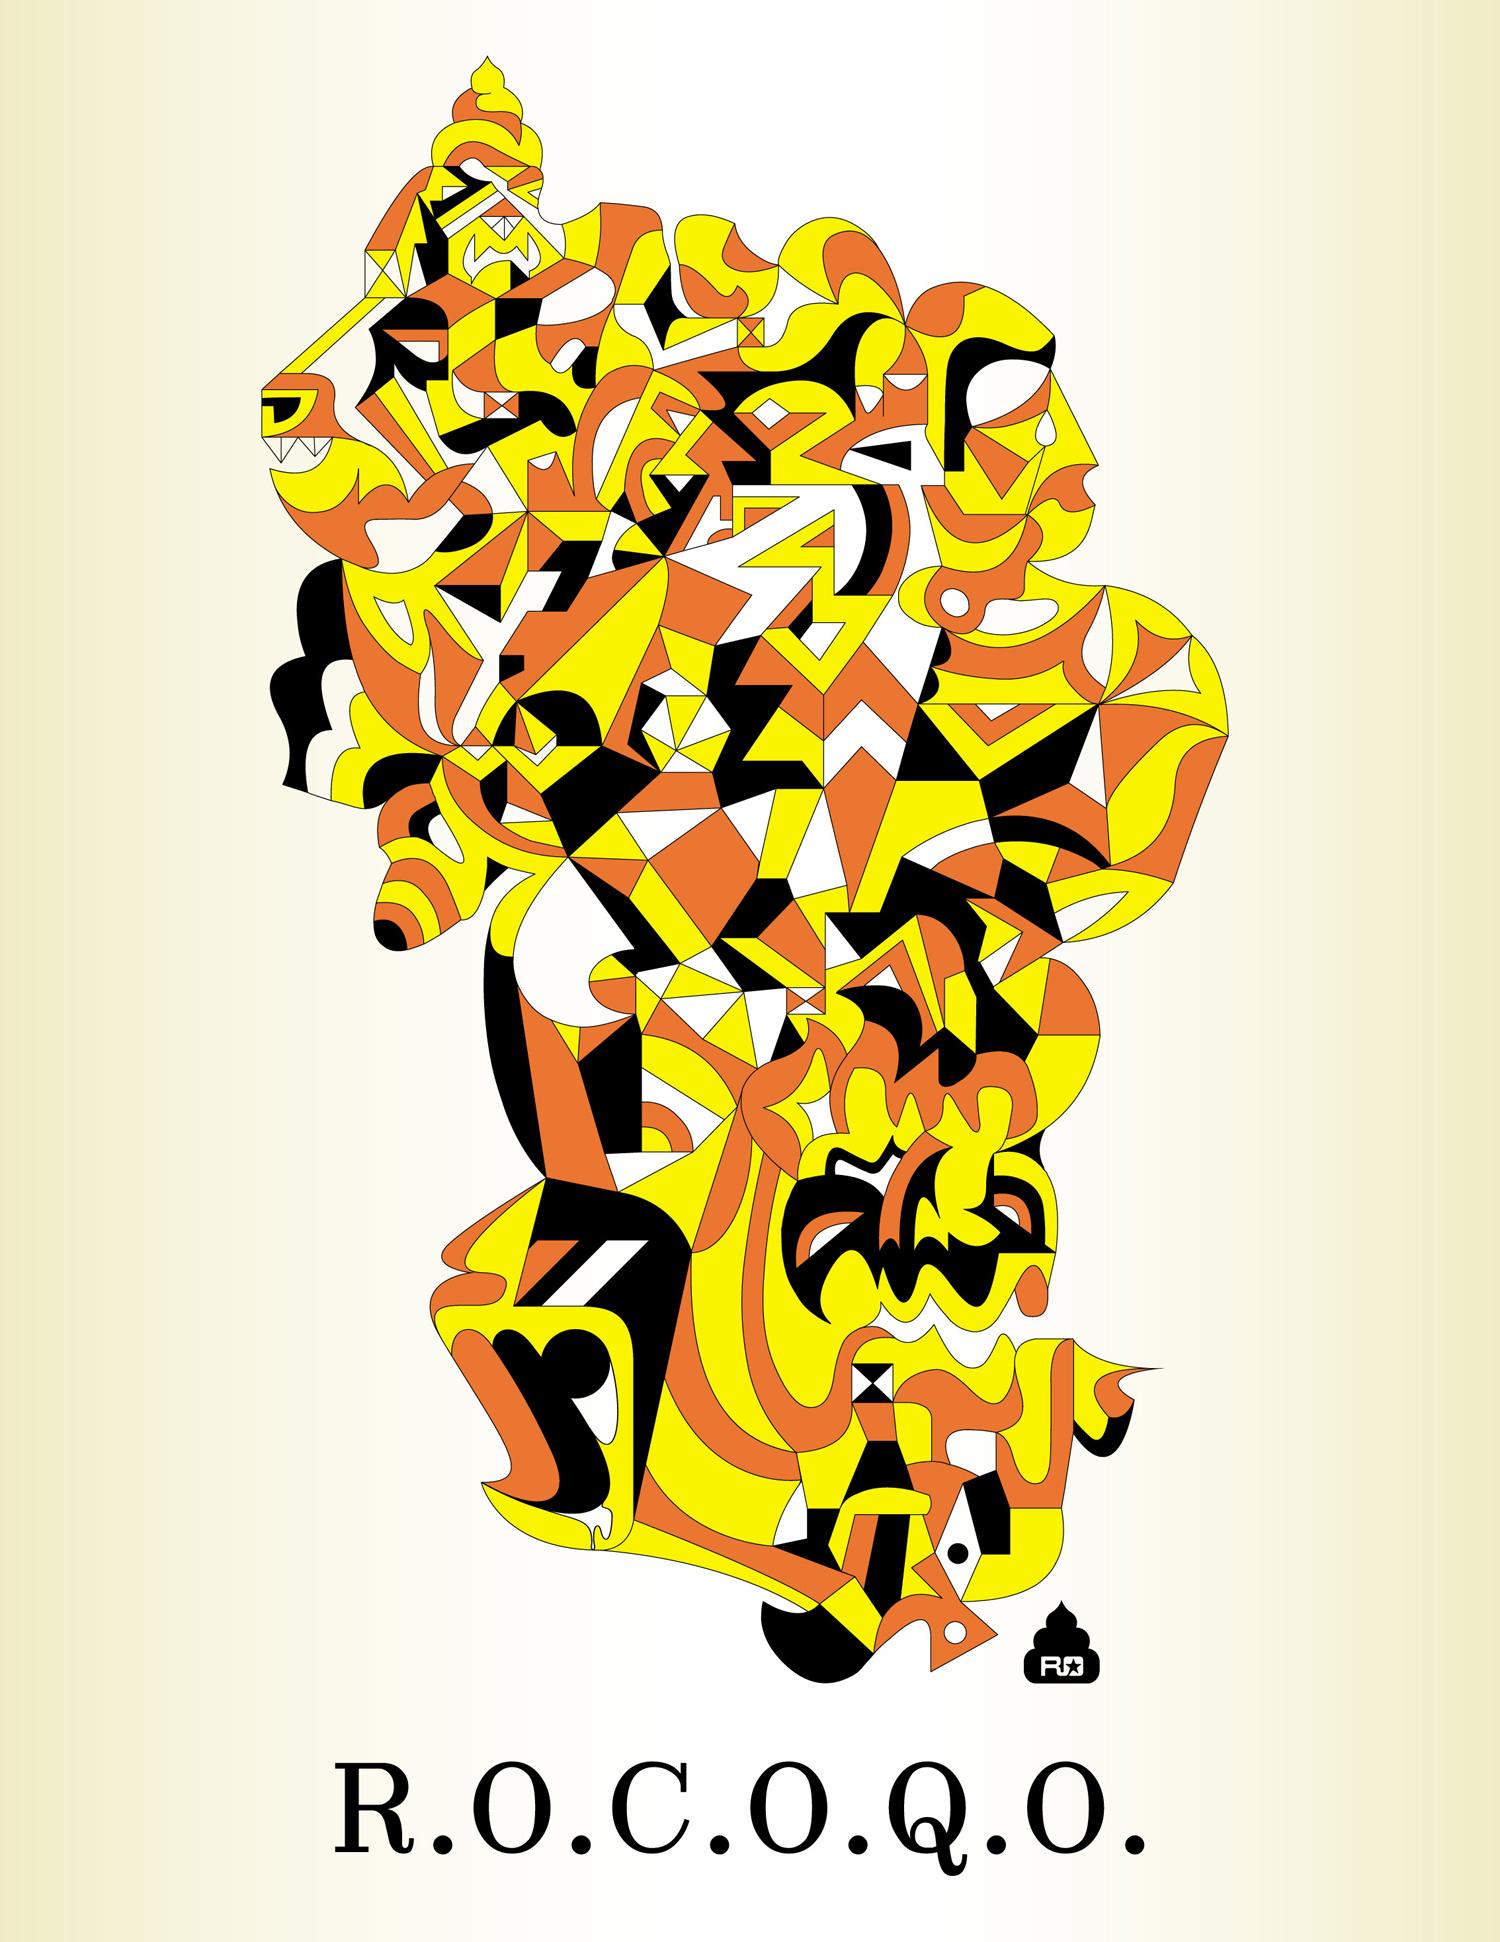 R.O.C.O.Q.O., 2002 computer generated vector art